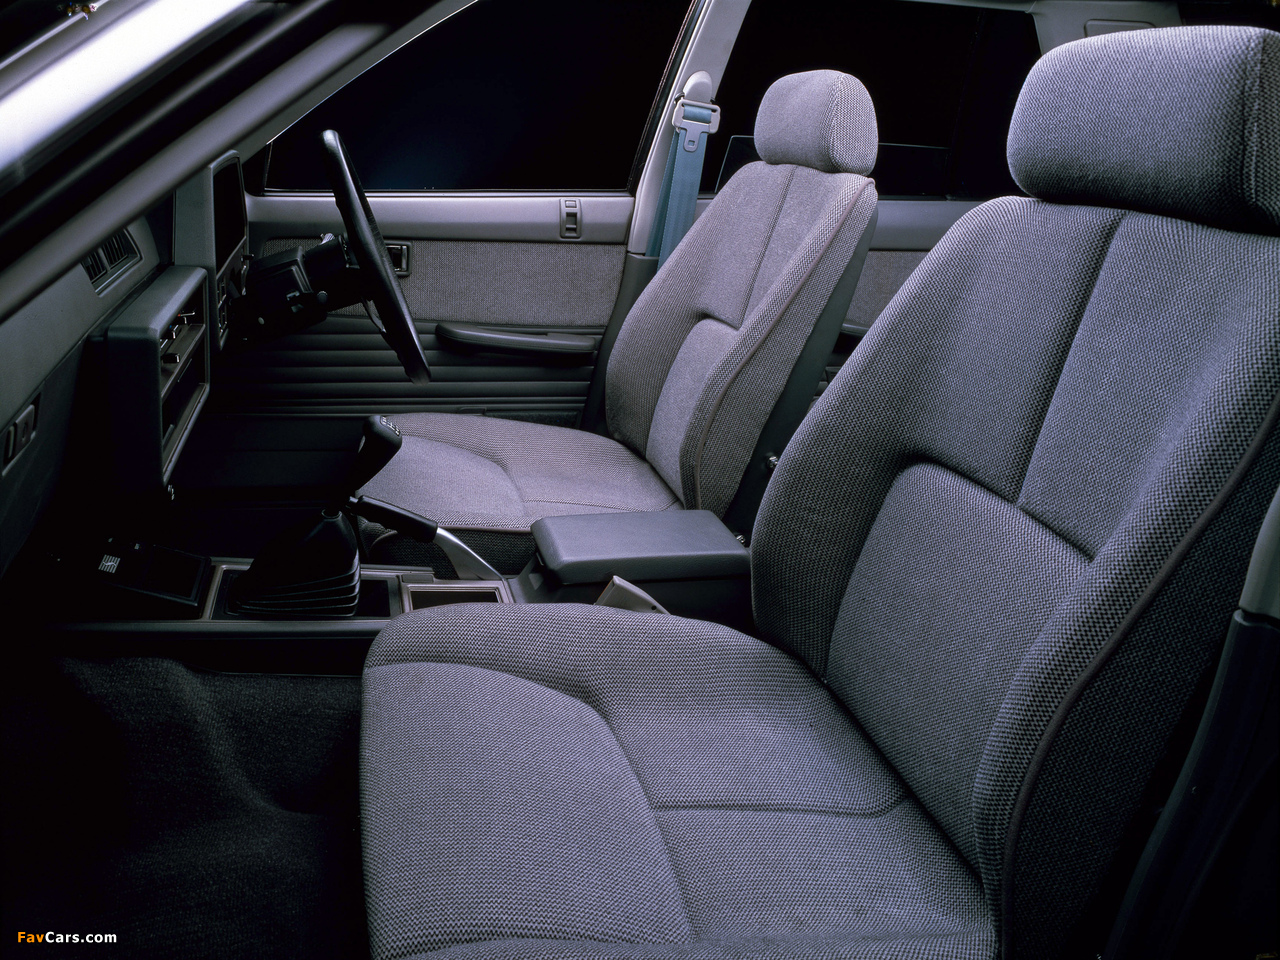 Nissan Skyline 2000 Turbo RS Sedan (DR30JFT) 1983 photos (1280 x 960)